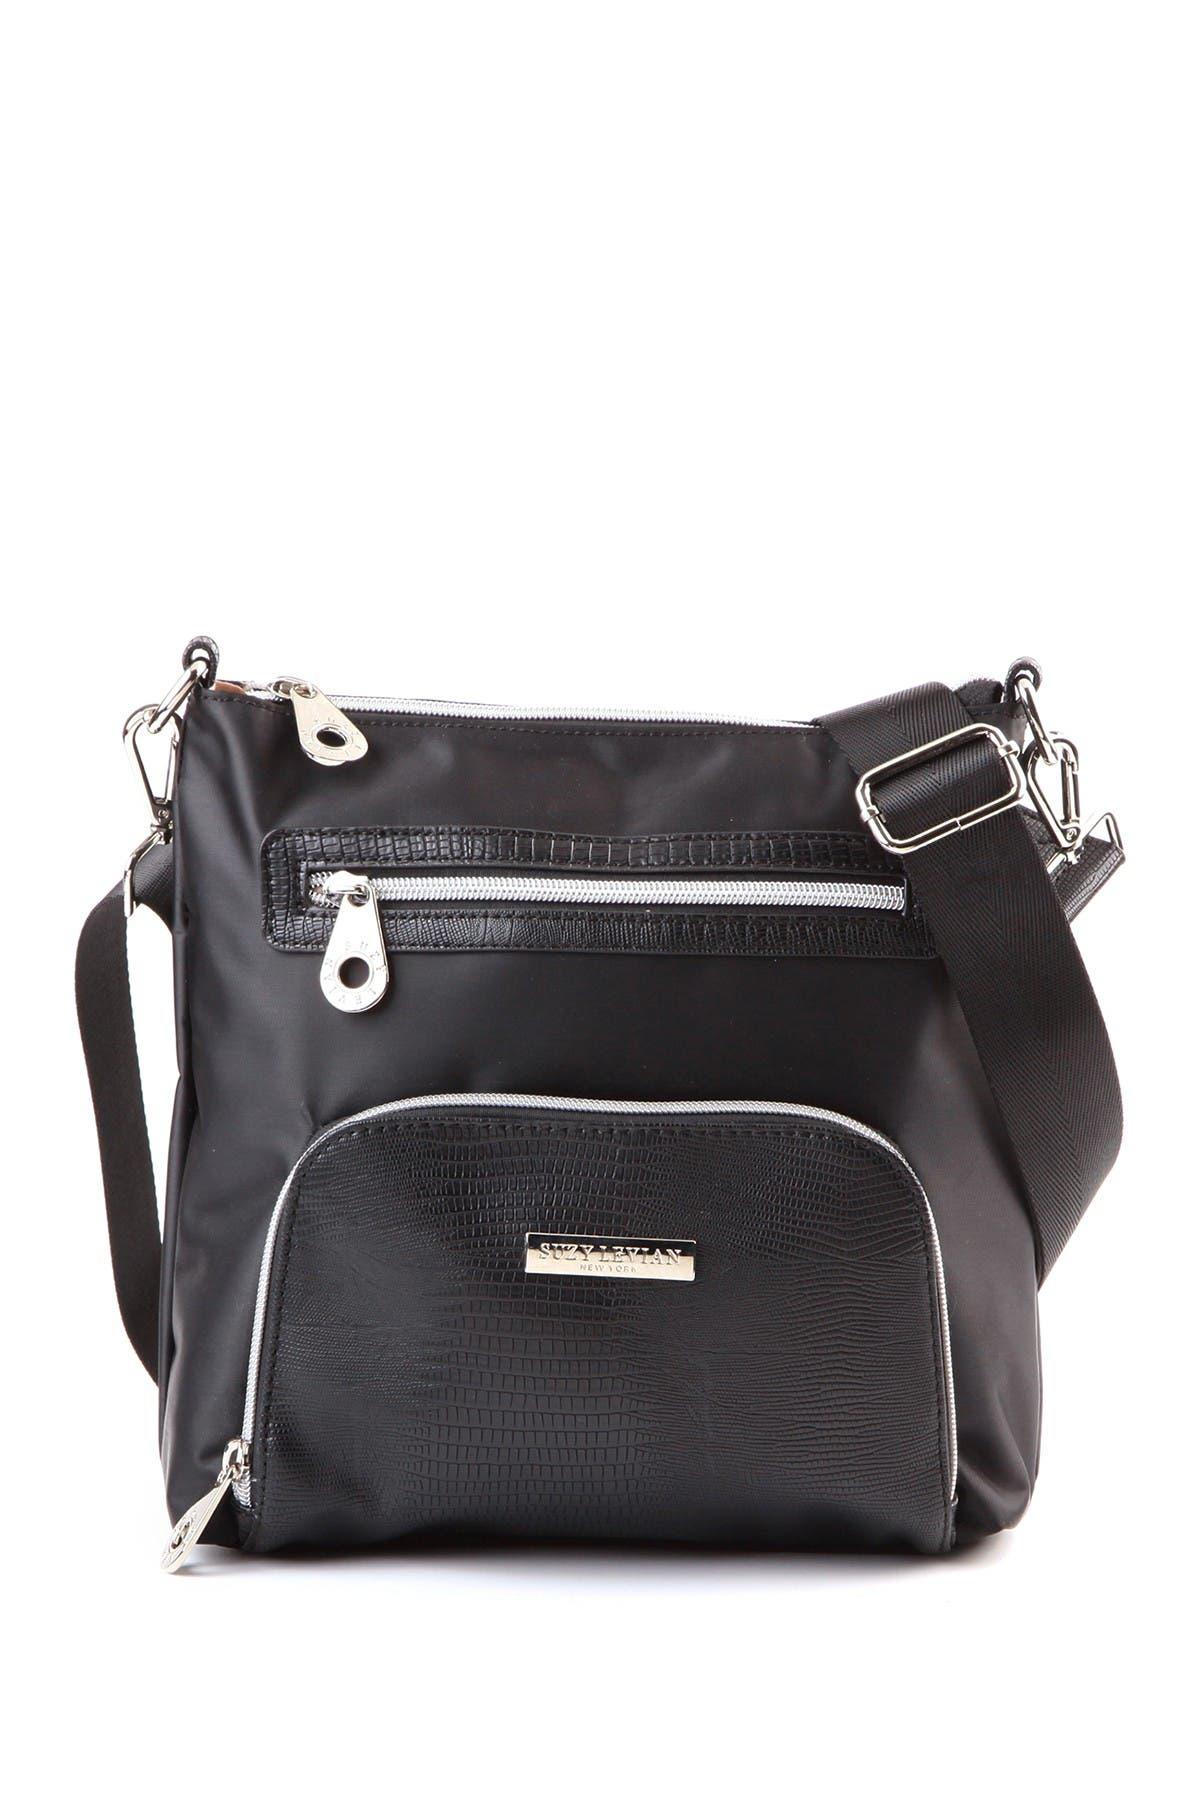 Image of Suzy Levian Nylon Crocodile Embossed Front Pocket Crossbody Bag